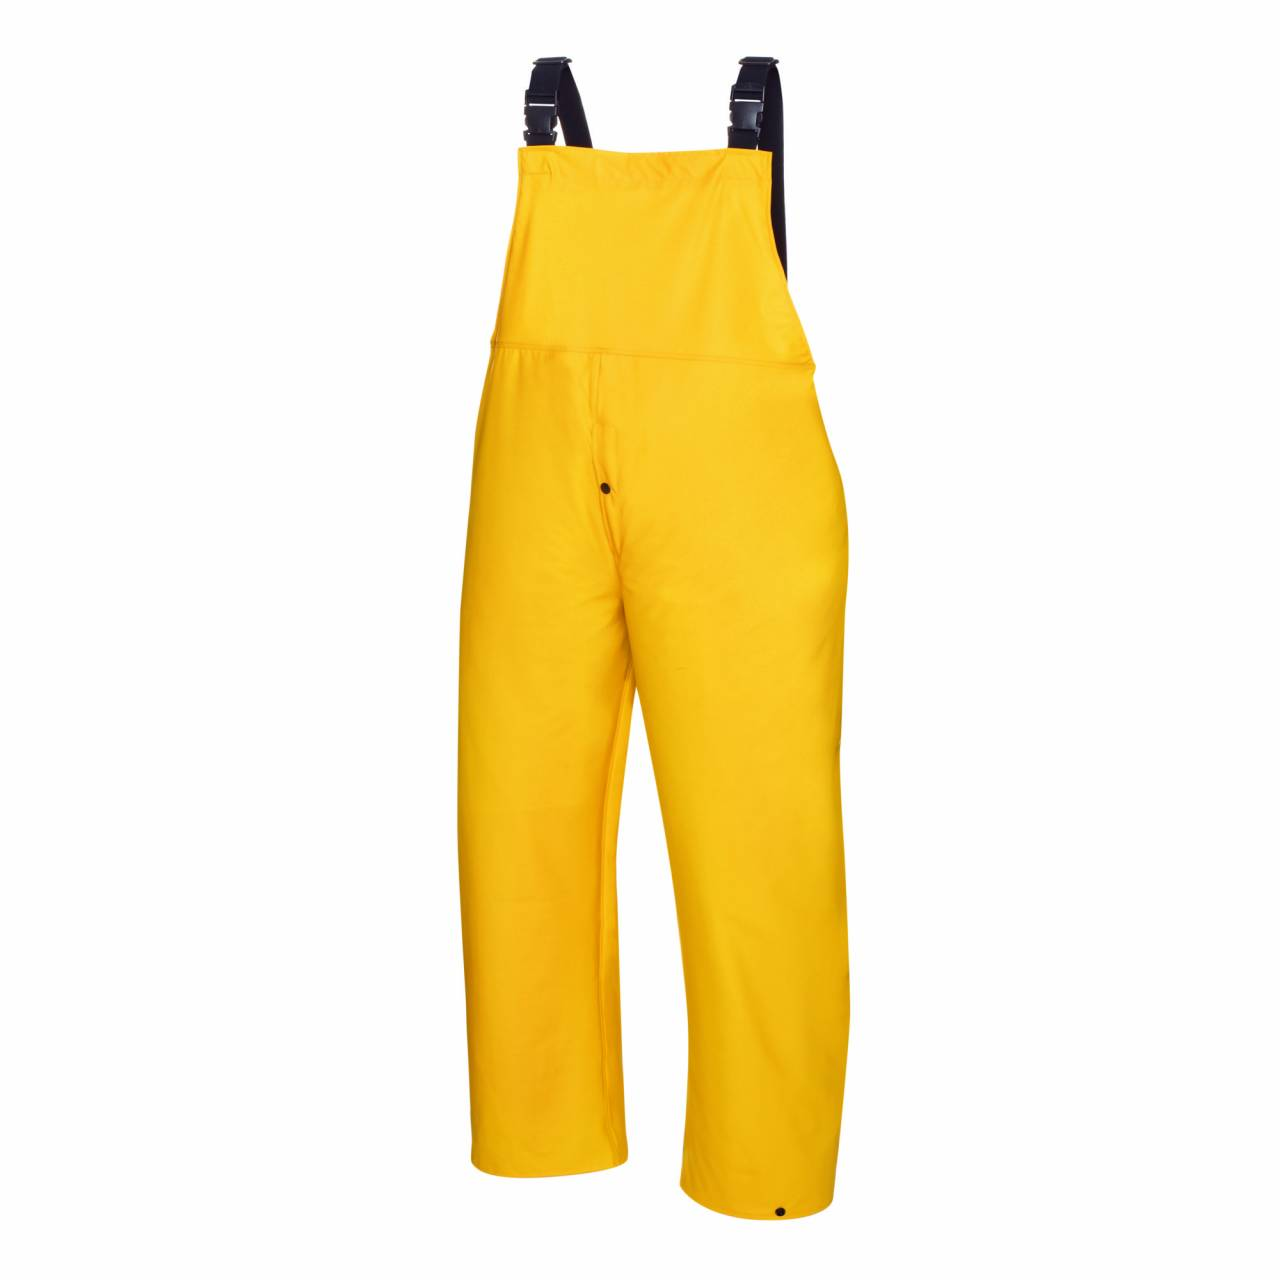 PU-Regenschutz-Latzhose gelb, Gr.M